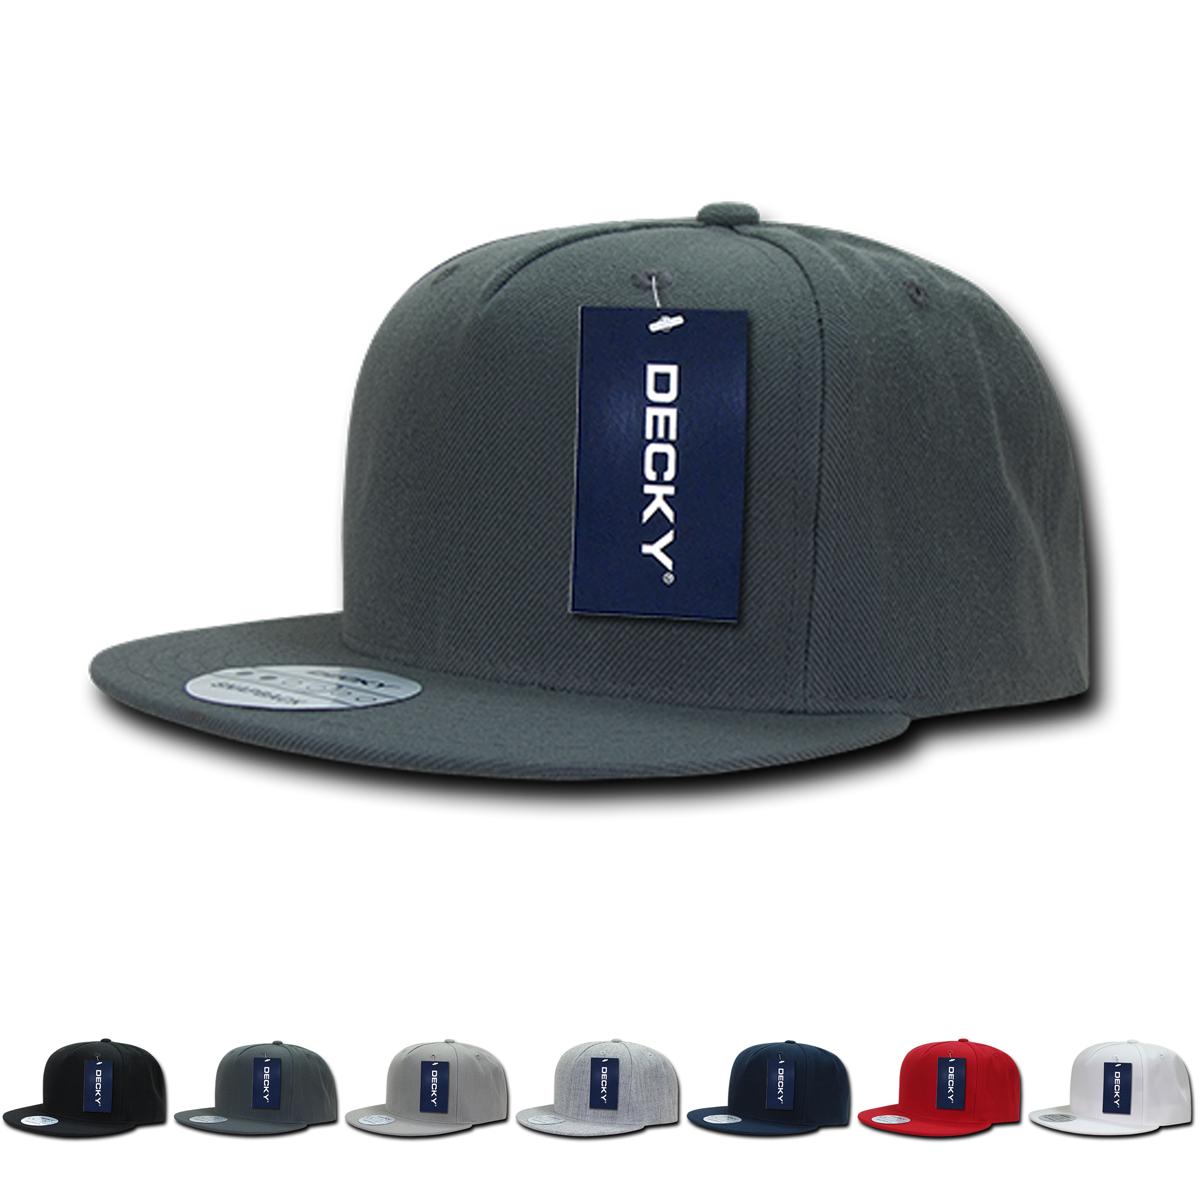 Wholesale Blank 5 Panel Snapback Flat Bill Hats Decky 333 Flat Bill Hats Wholesale Blanks Hats